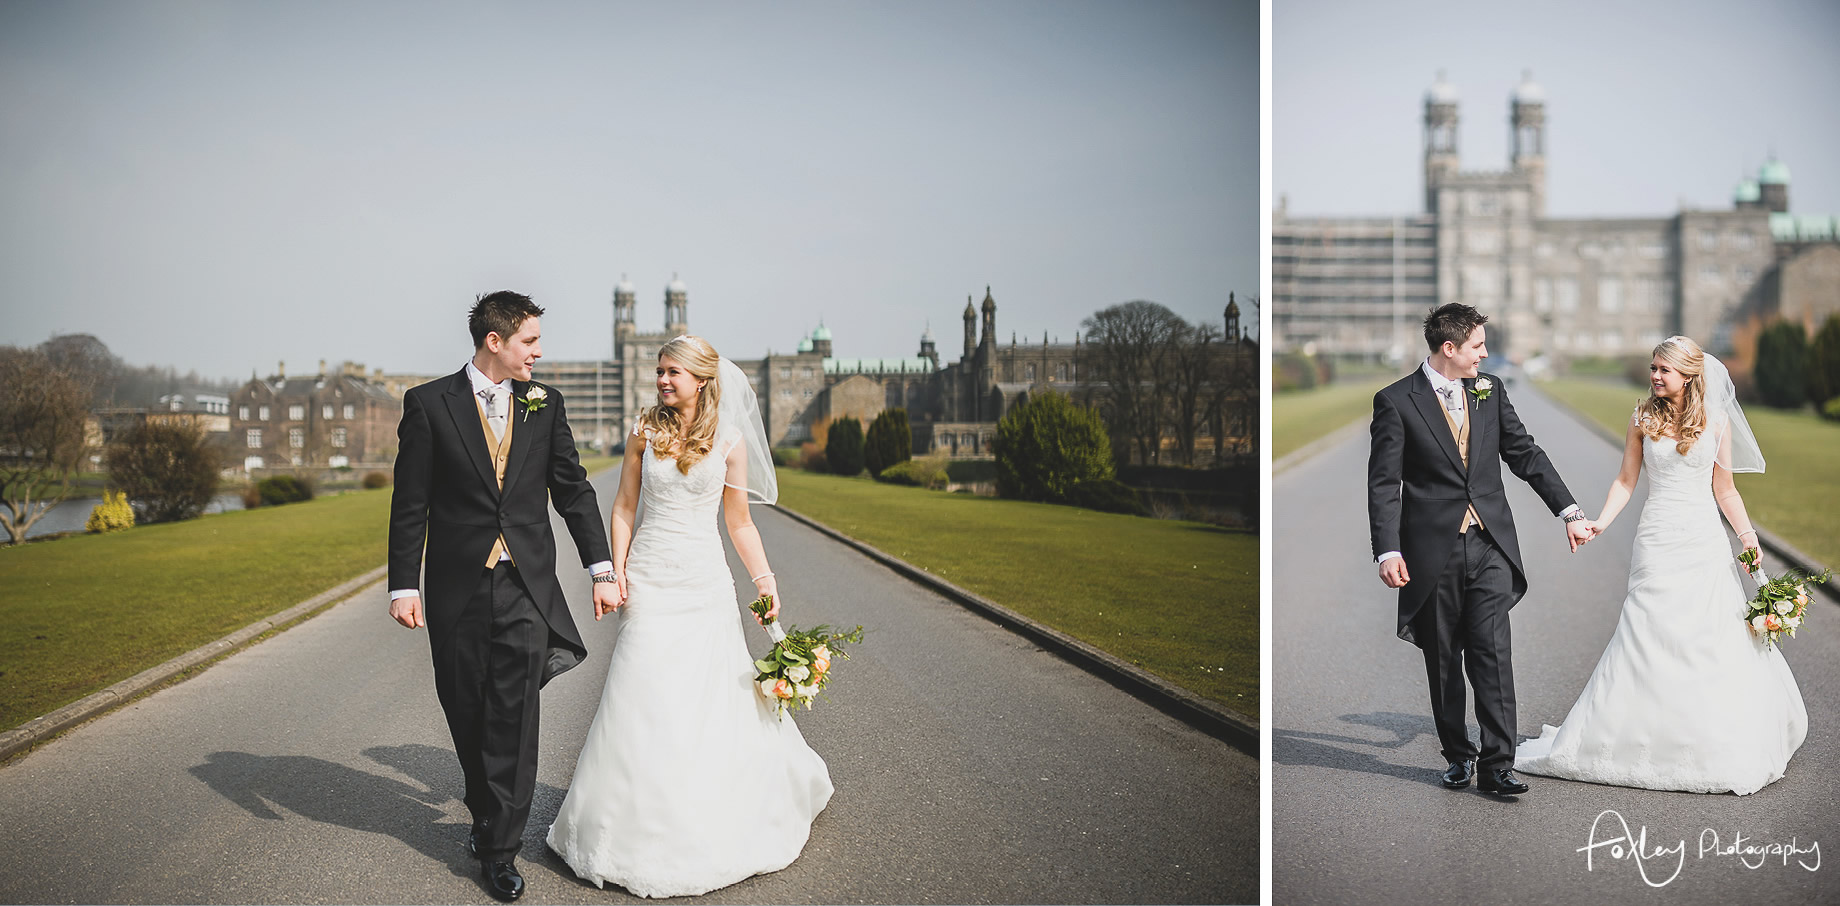 Gemma and Lewis' Wedding at Mitton Hall 090